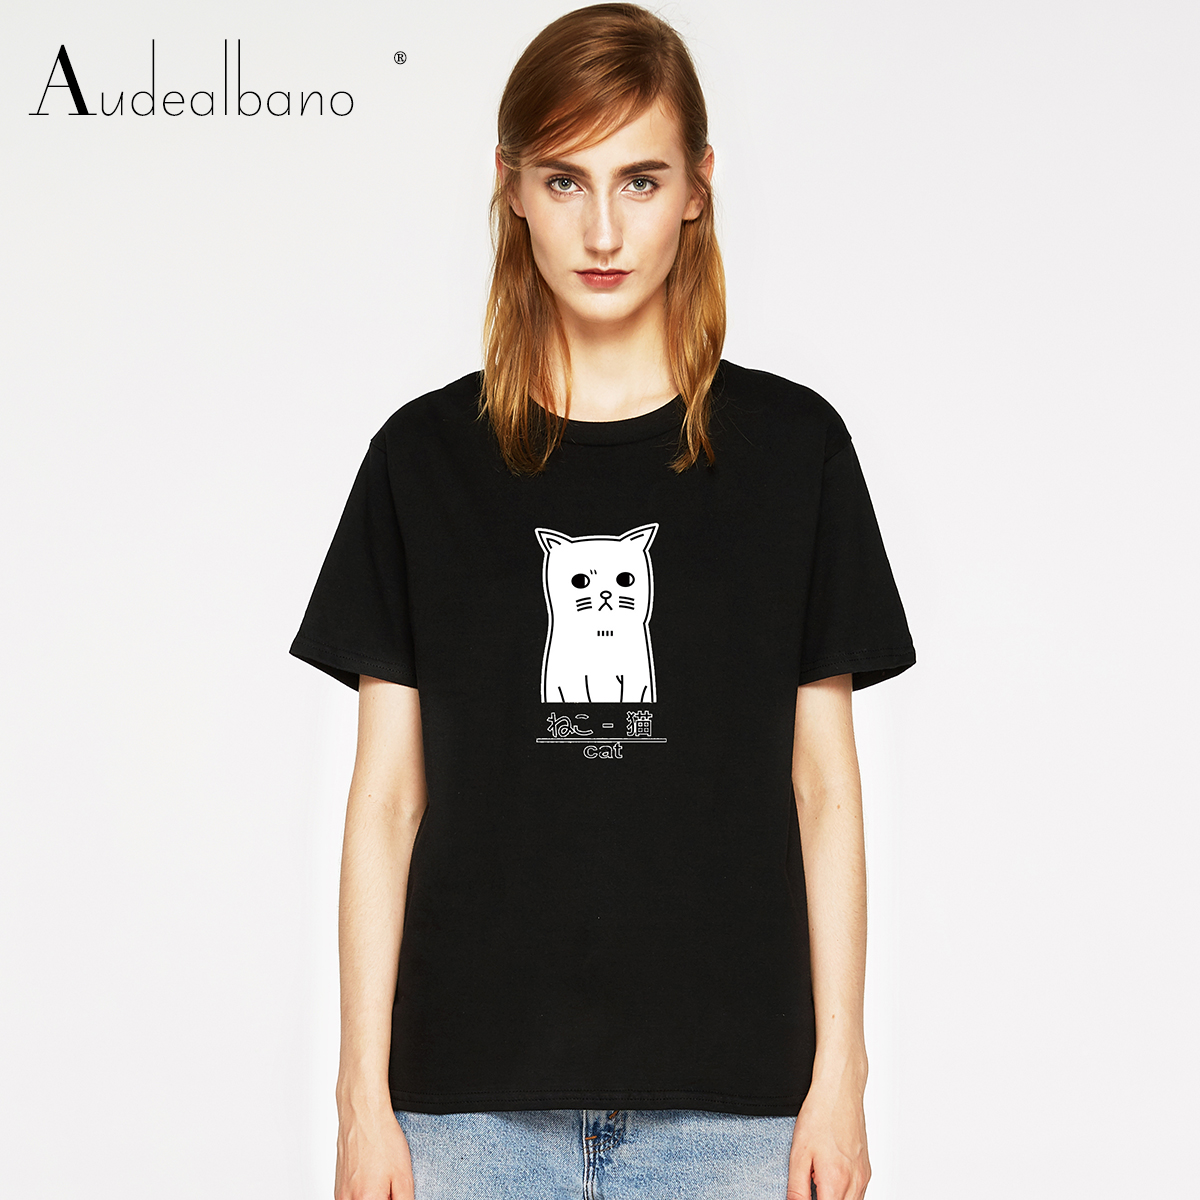 Kawaii Sweatshirt with Falbala 2-6T Short-Sleeve Cat Face T-Shirts for Girls